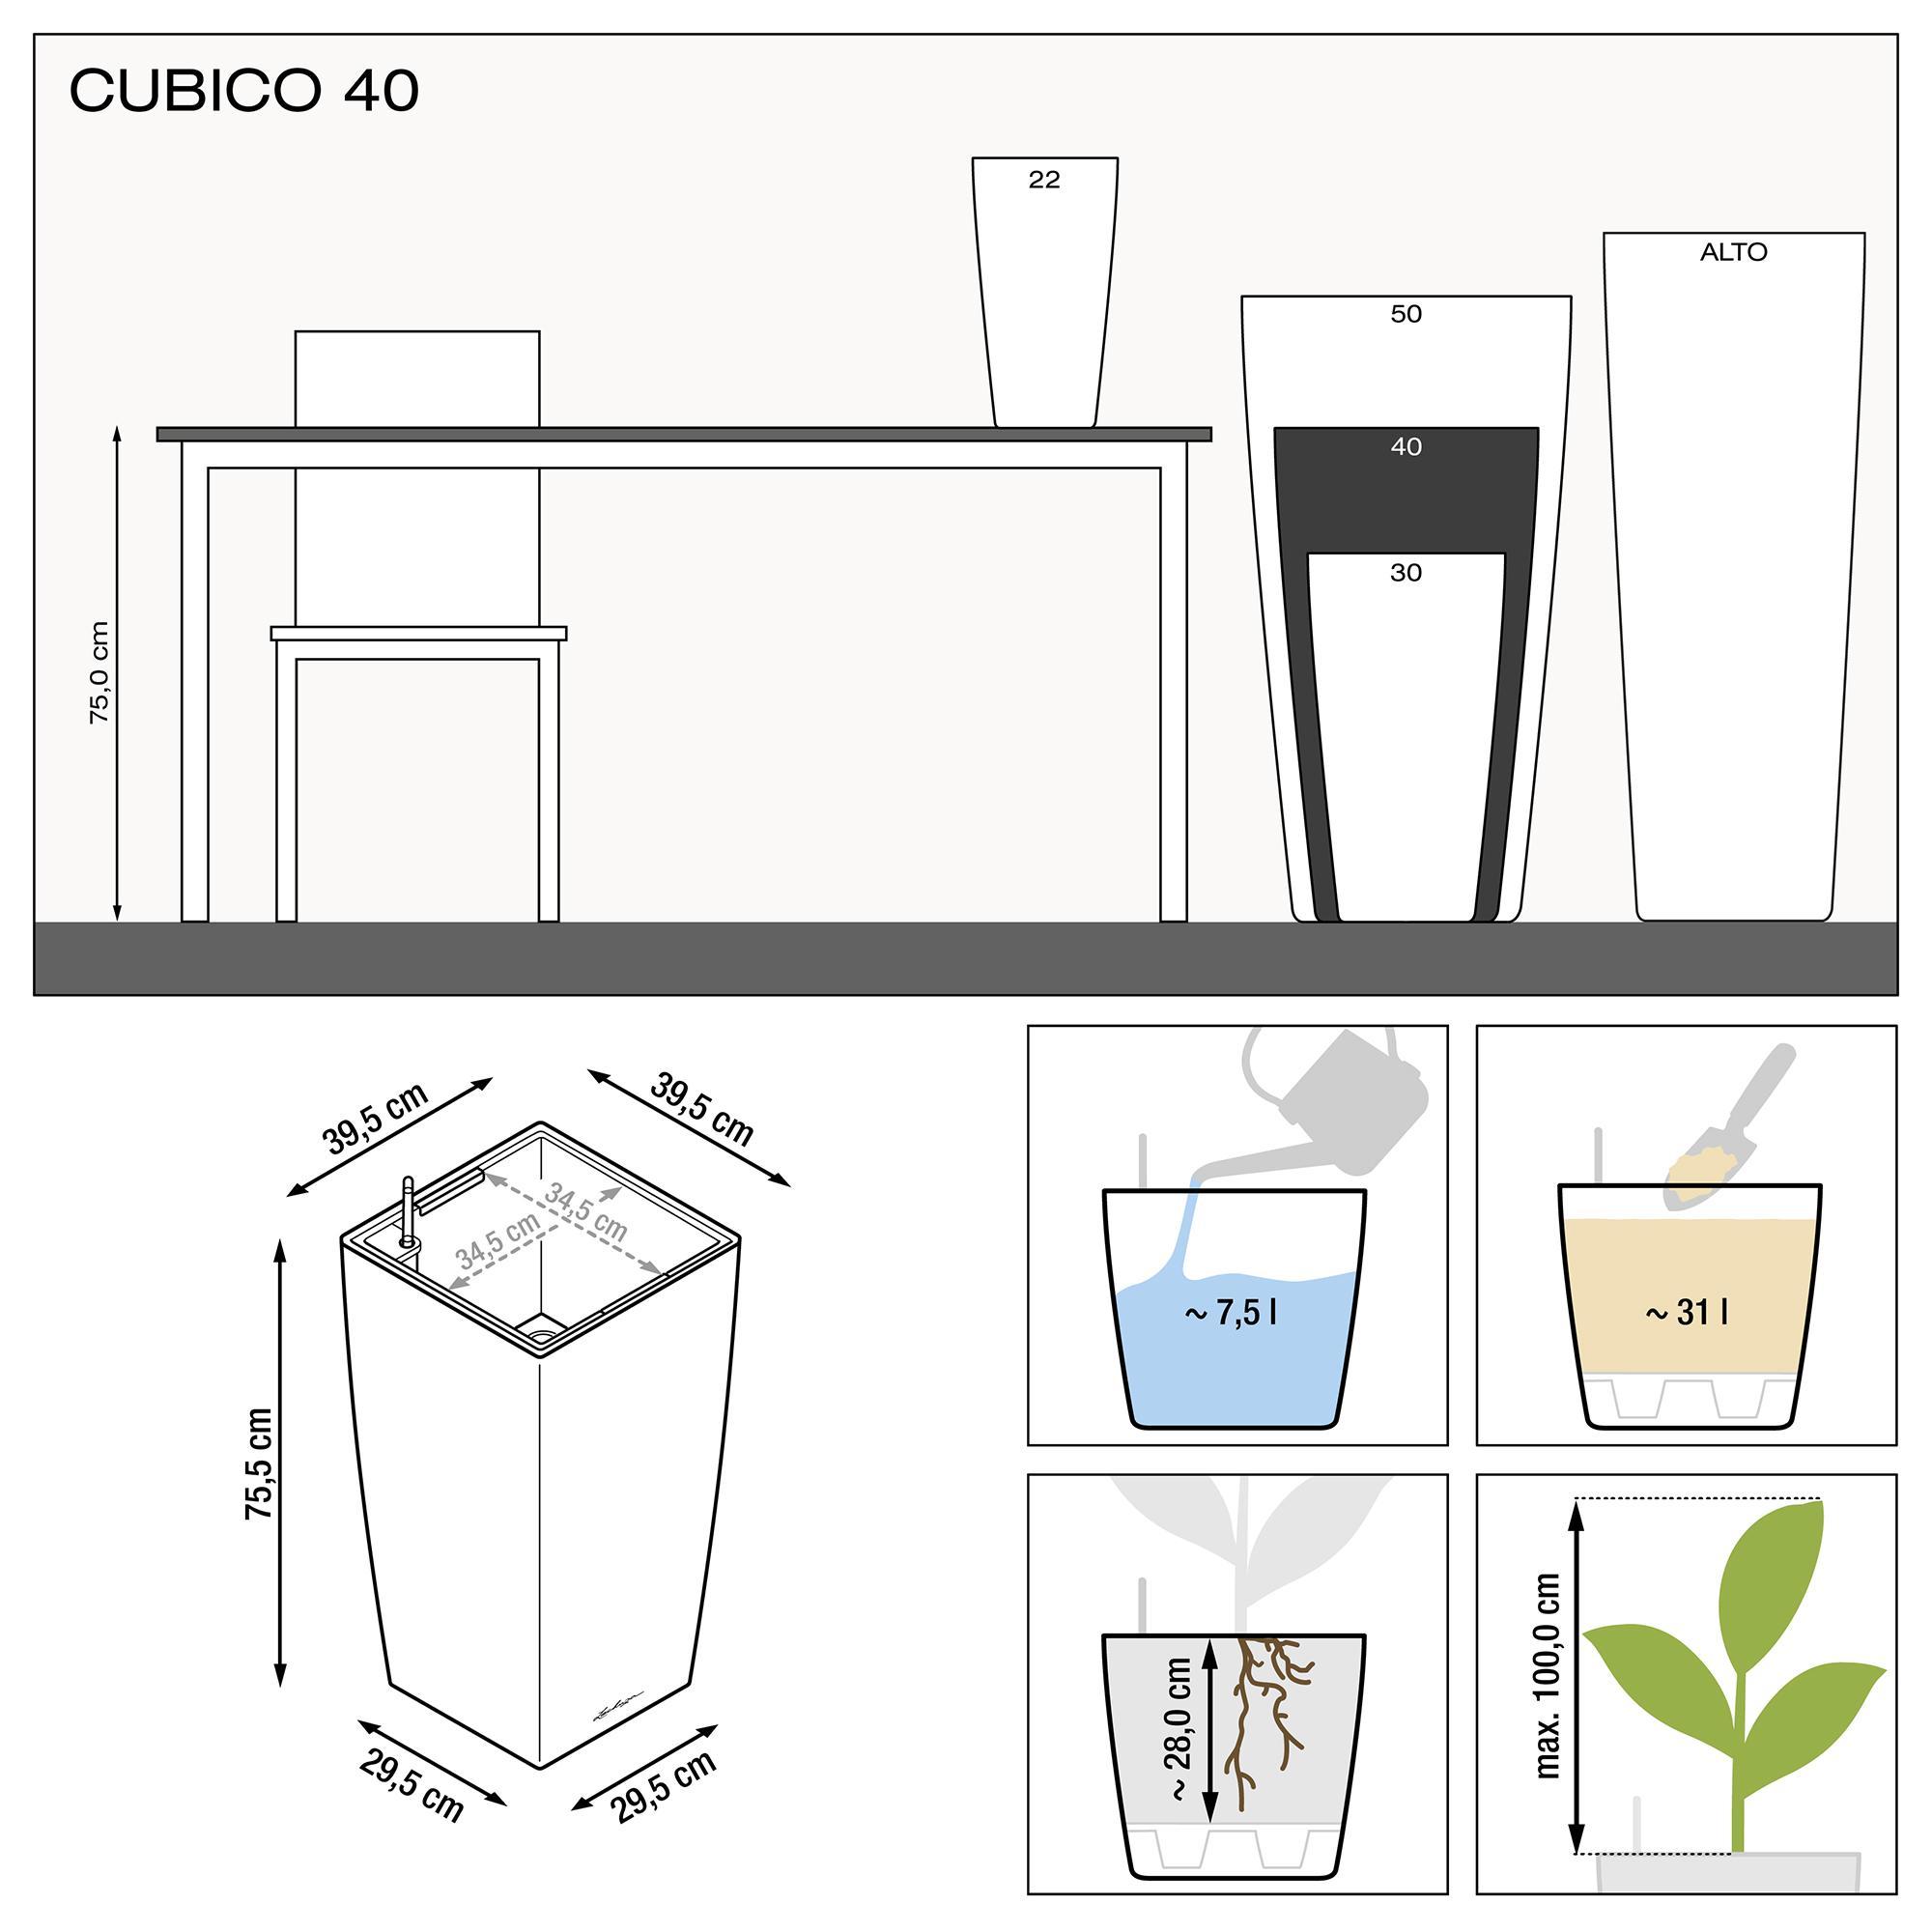 le_cubico40_product_addi_nz